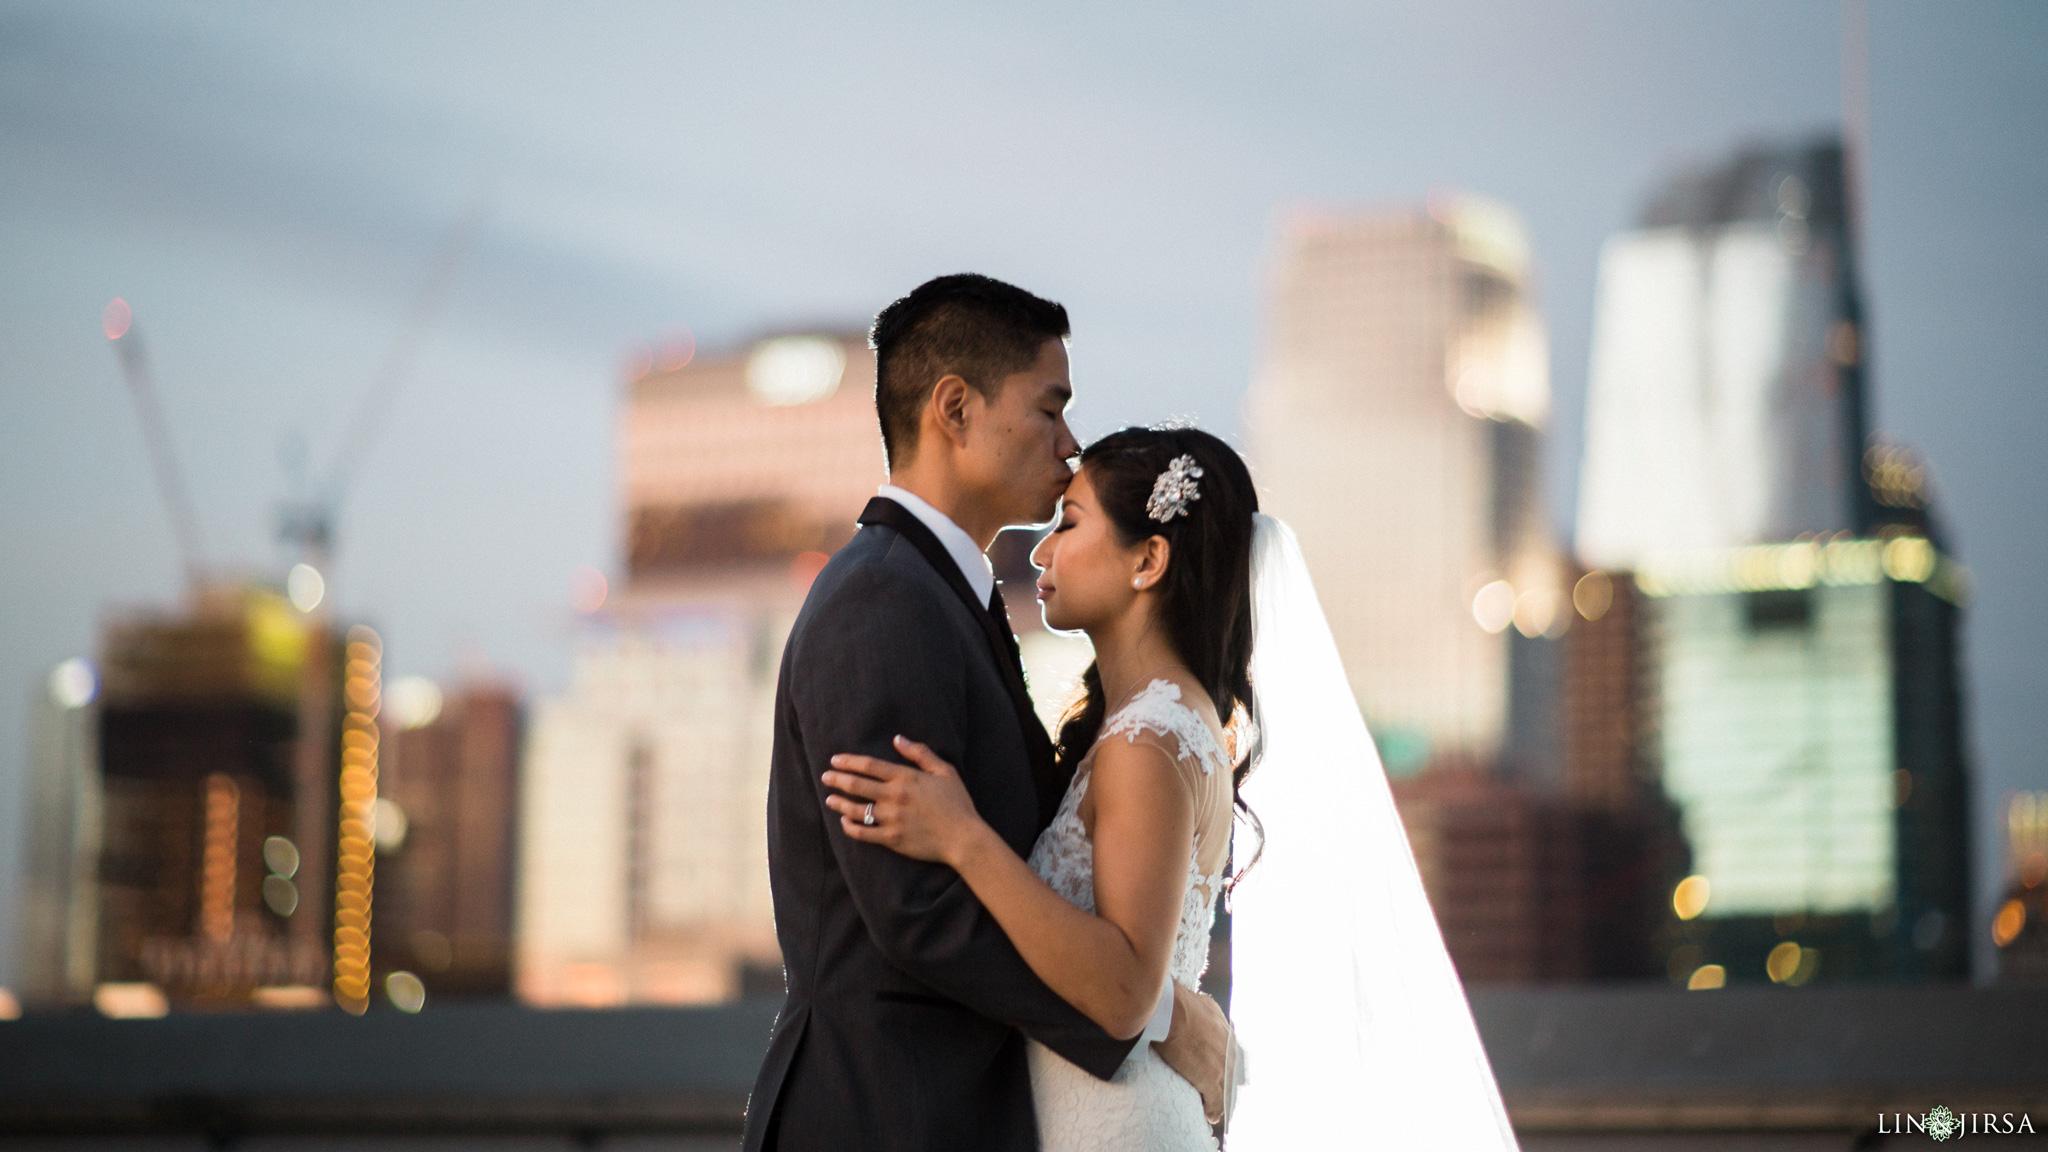 28-hudson-loft-downtown-los-angeles-wedding-photography